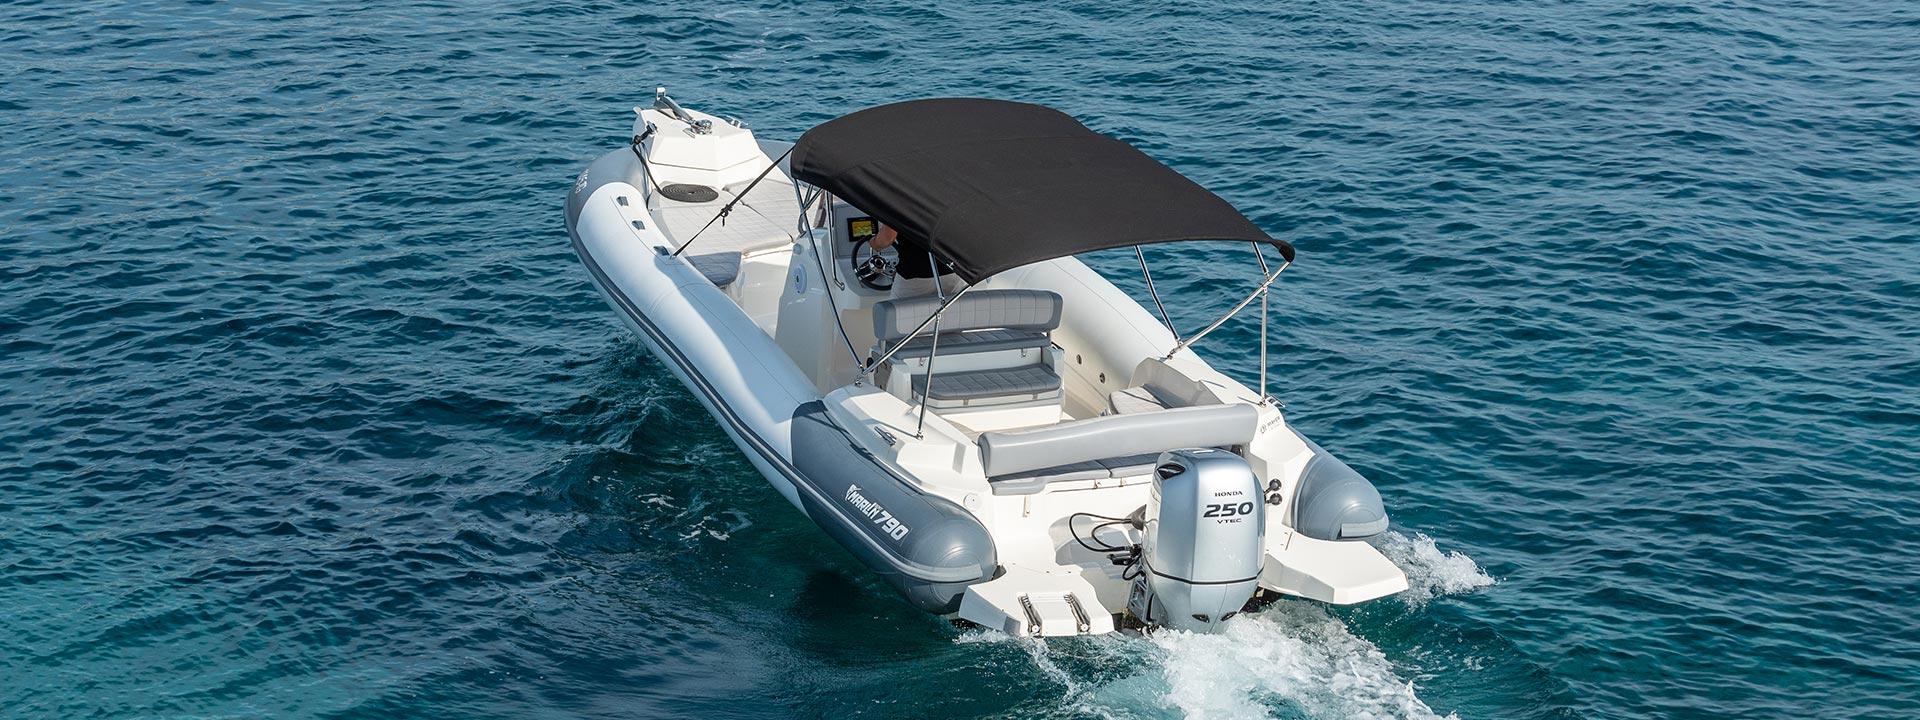 mayer-charter-boat-header-jeanneau-marlin-790-08